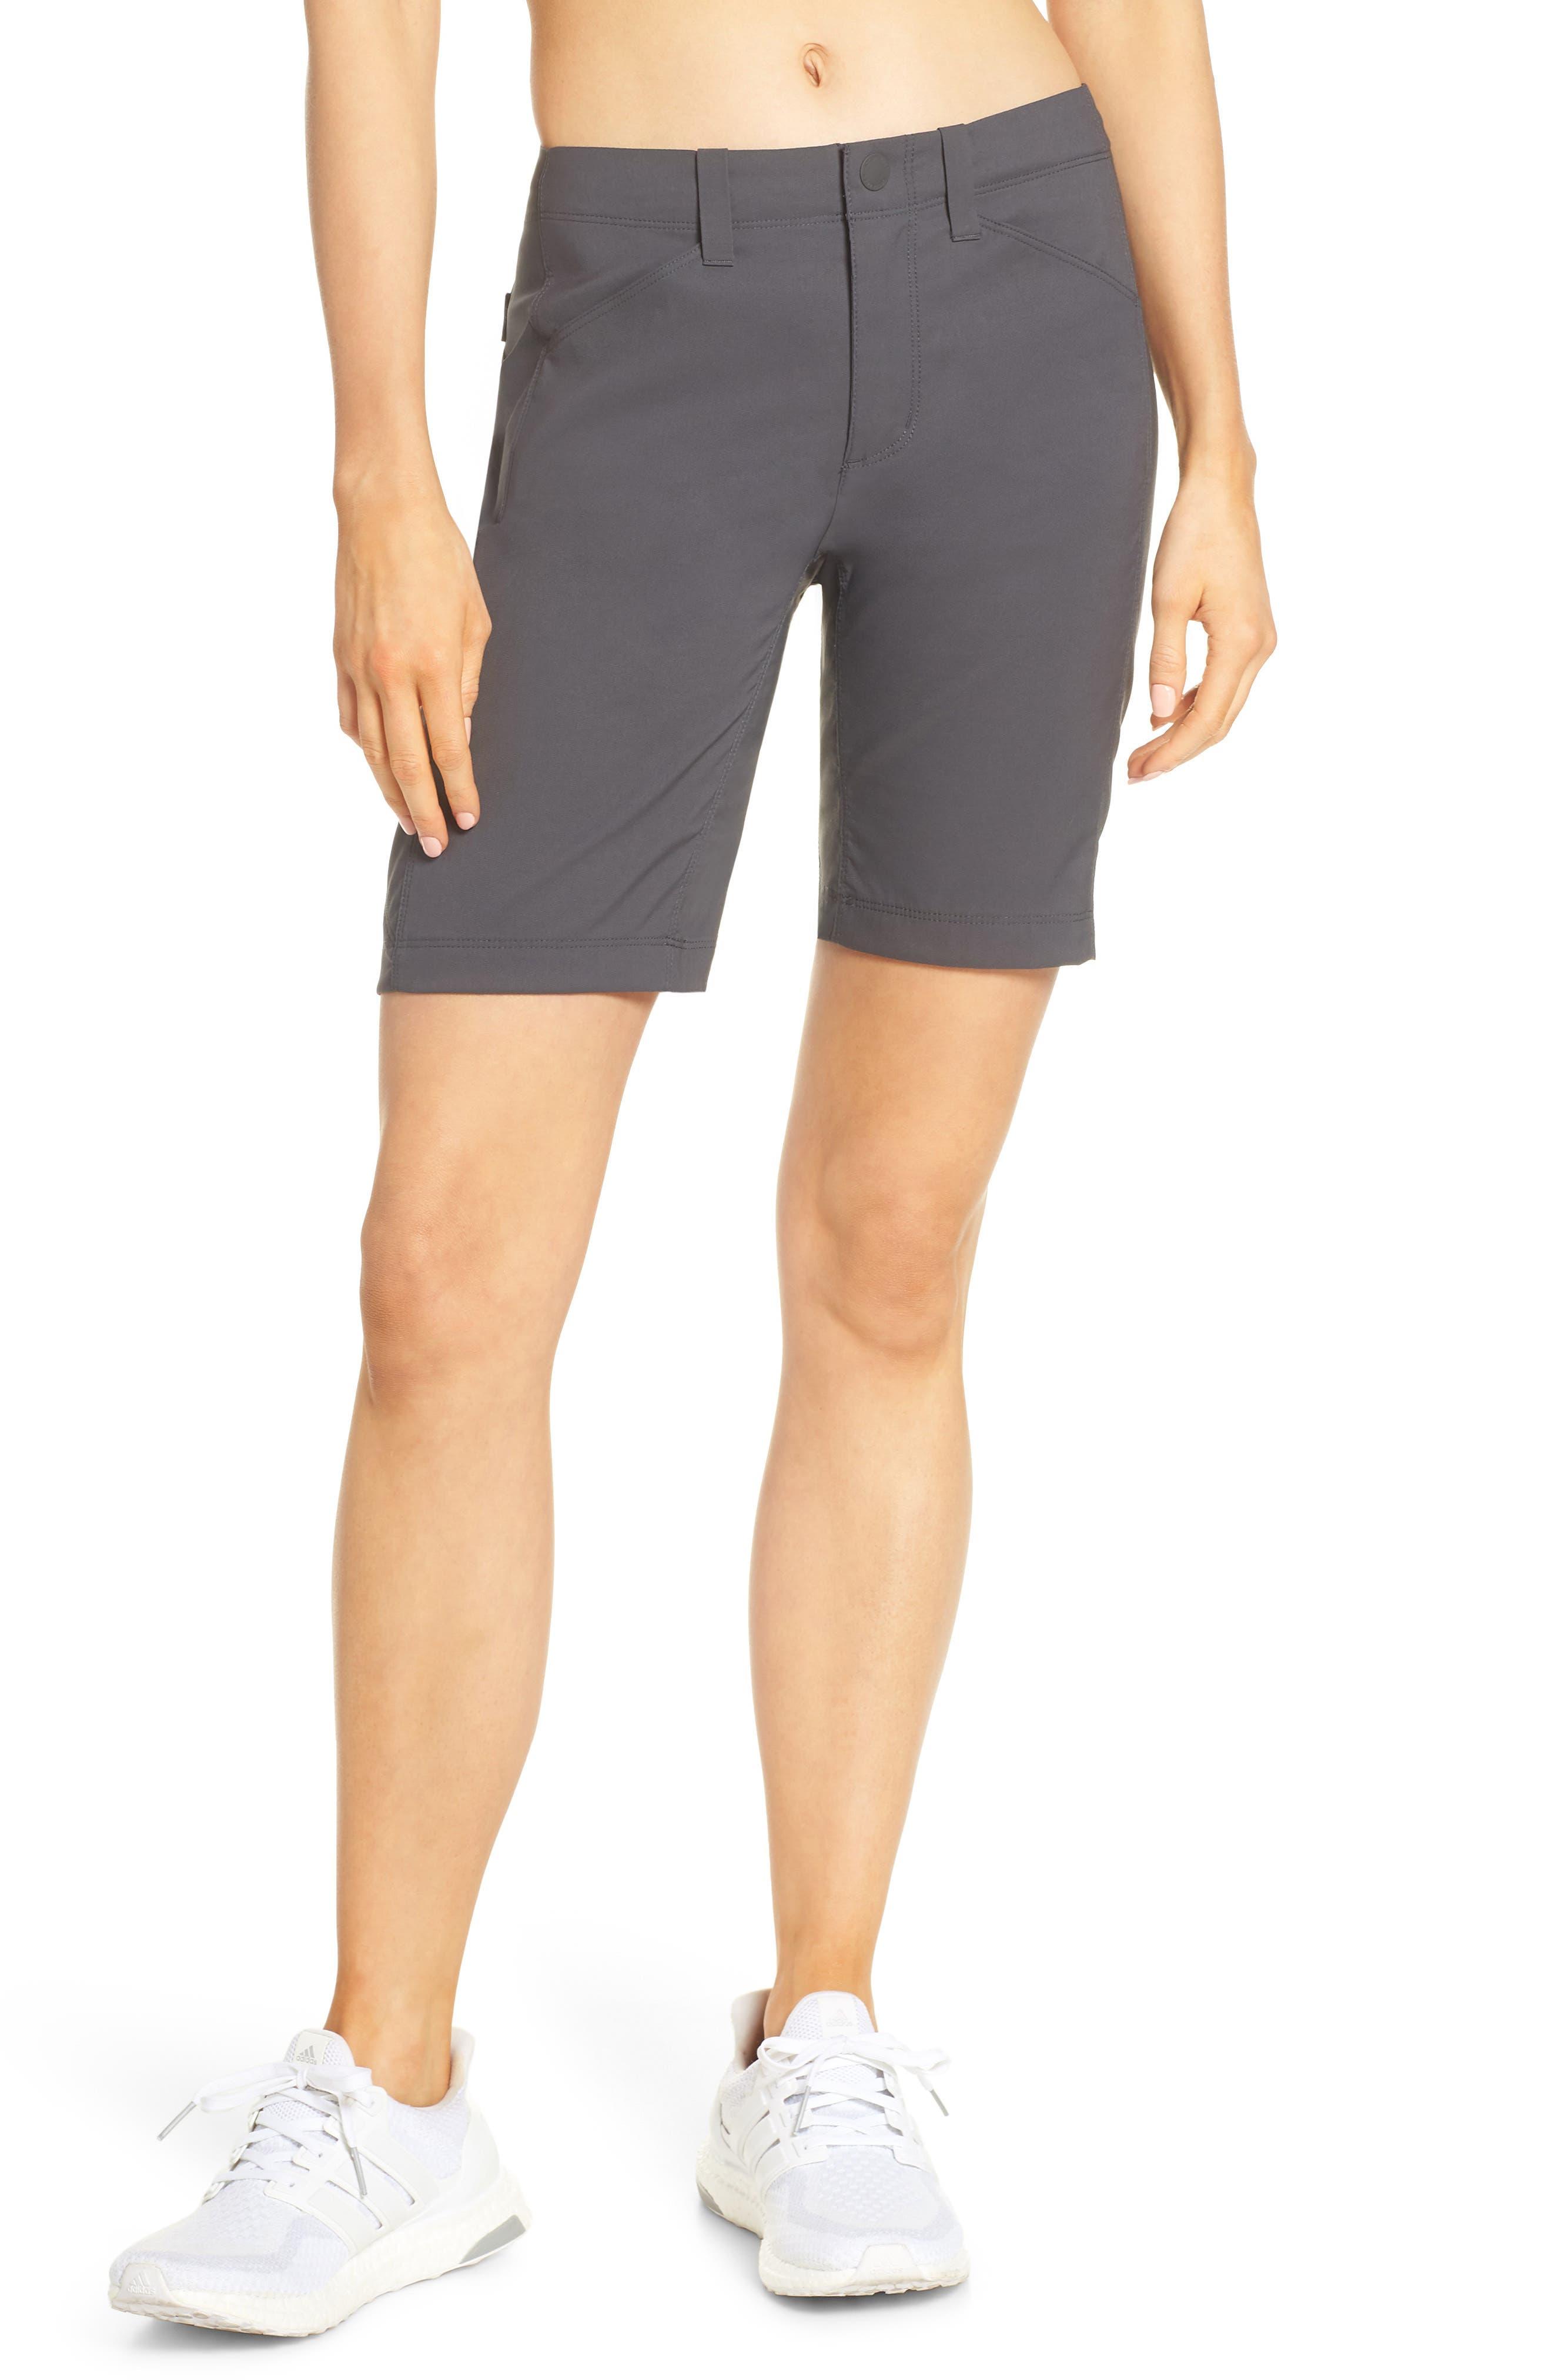 Icebreaker Persist Shorts, 7 - Grey